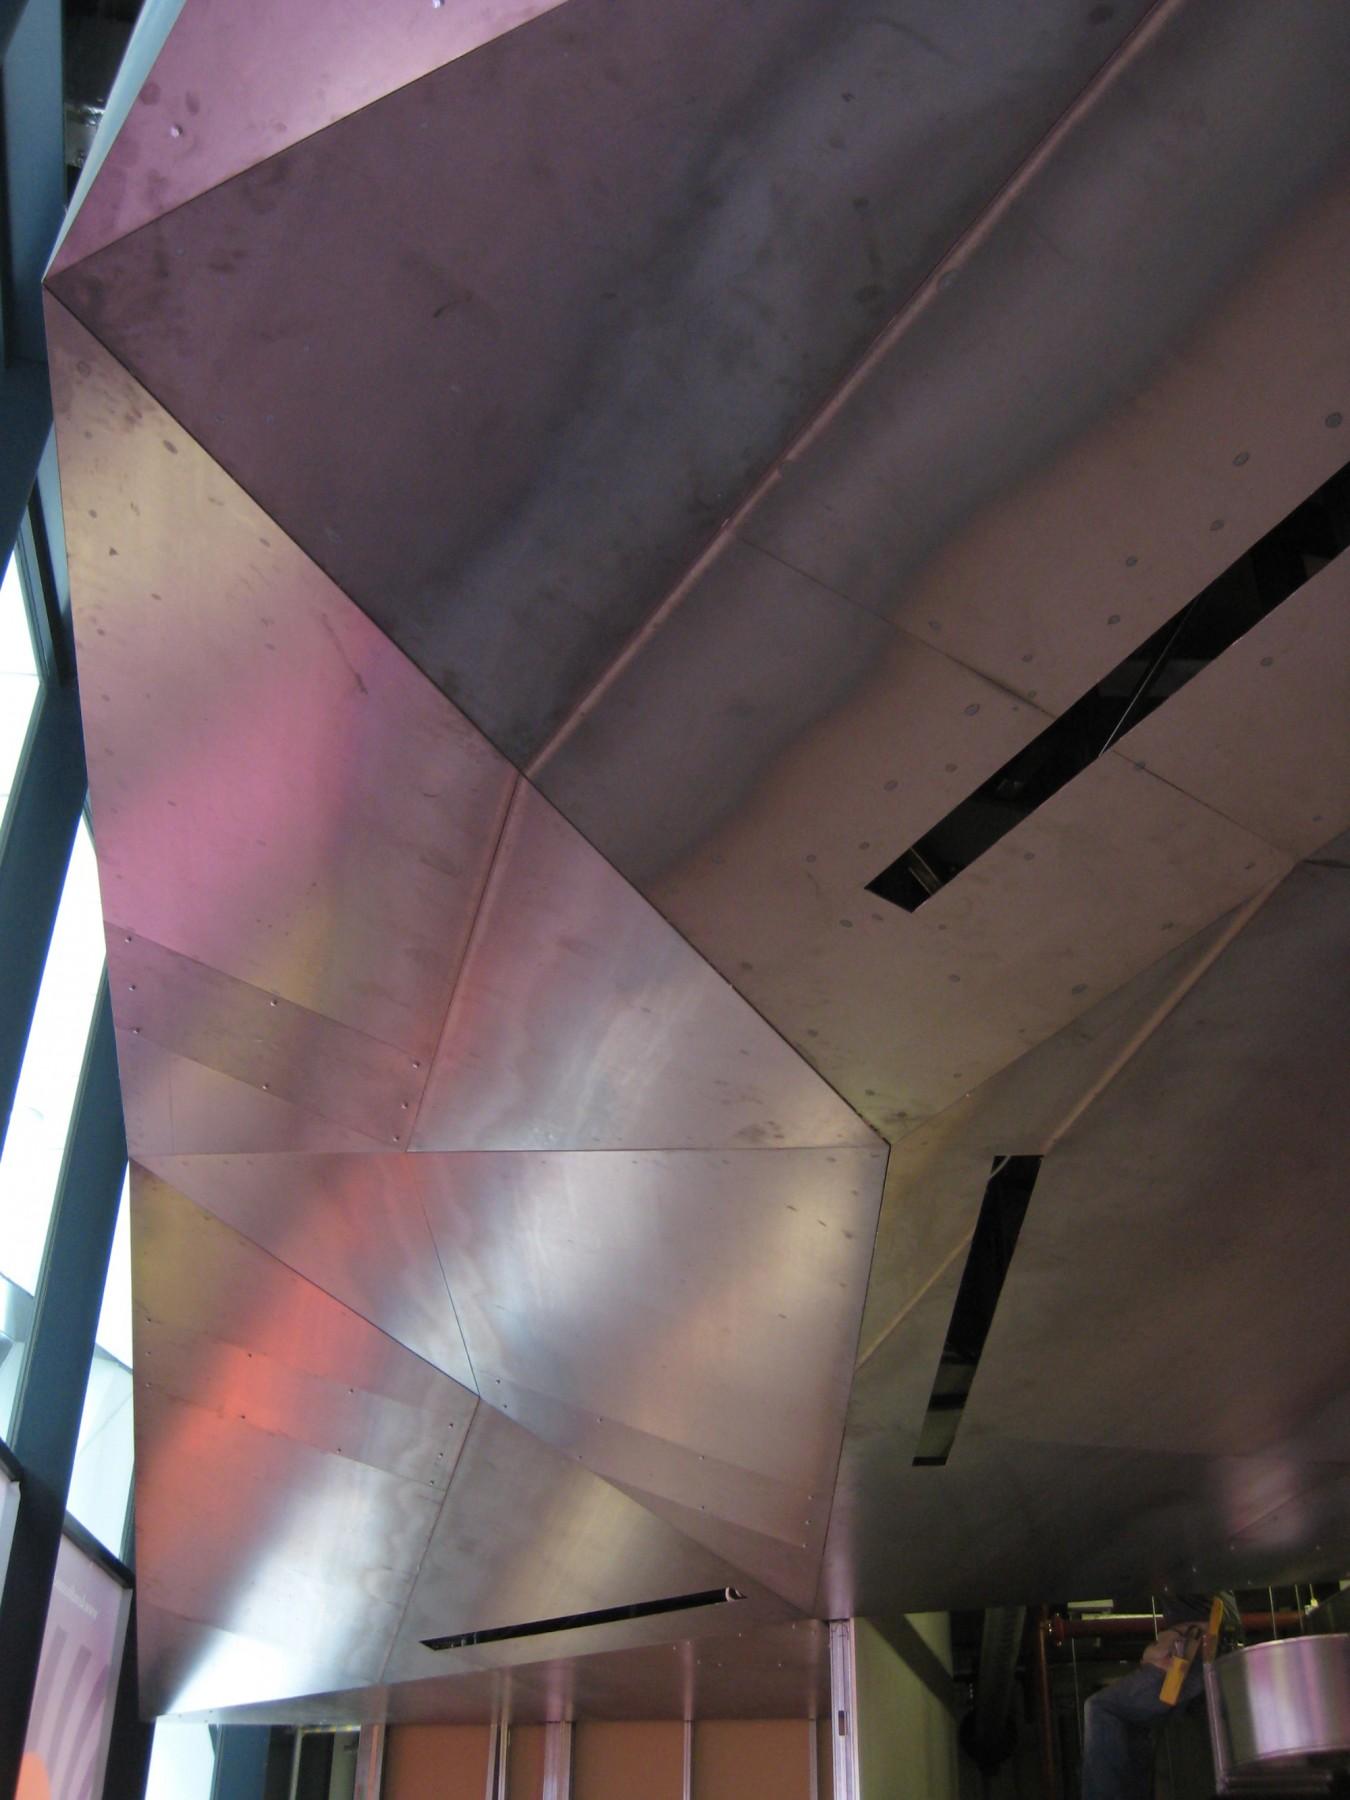 Konditor-&-Cook-cake-shop-cafe-retail-London-Jamie-Fobert-Architects-steel-30-St-Mary-Axe-gherkin-development-1